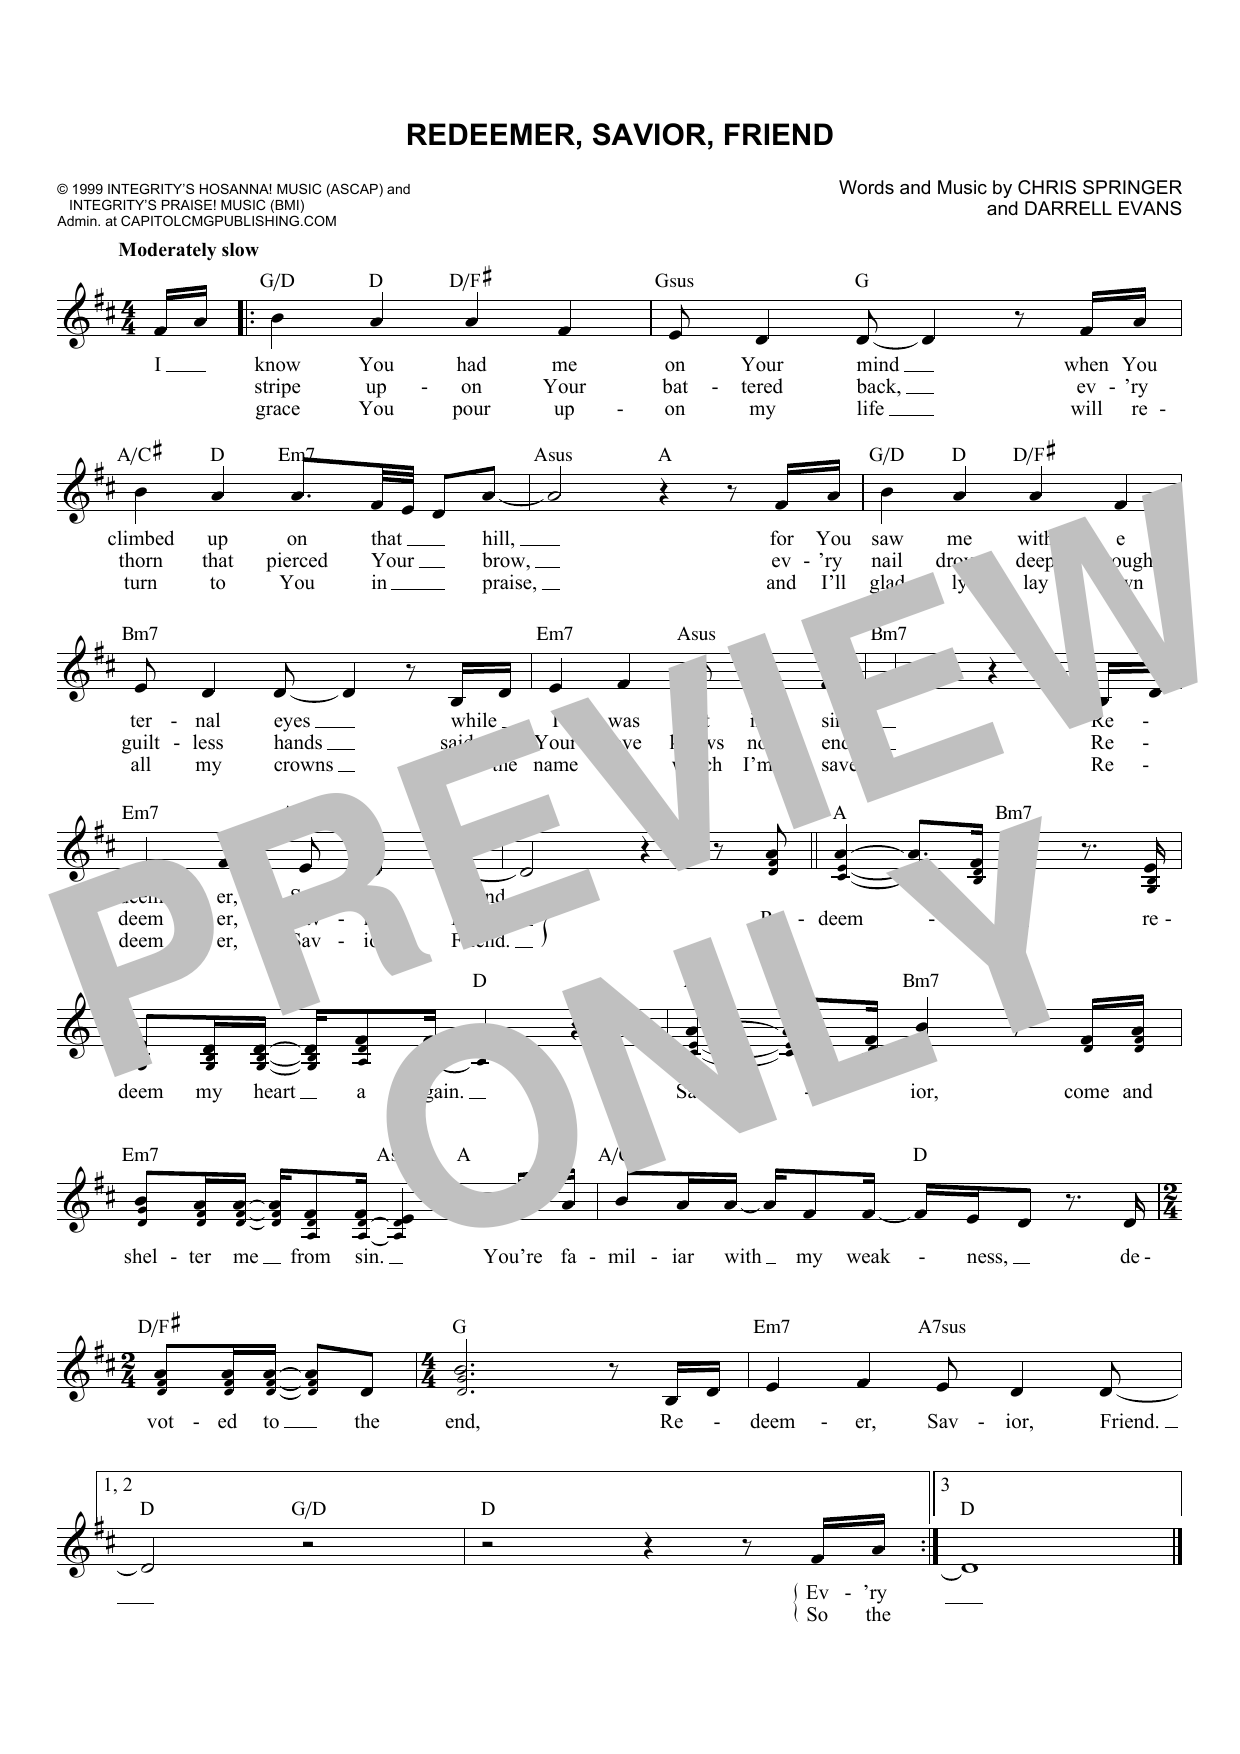 Chris Springer Redeemer, Savior, Friend sheet music notes and chords. Download Printable PDF.